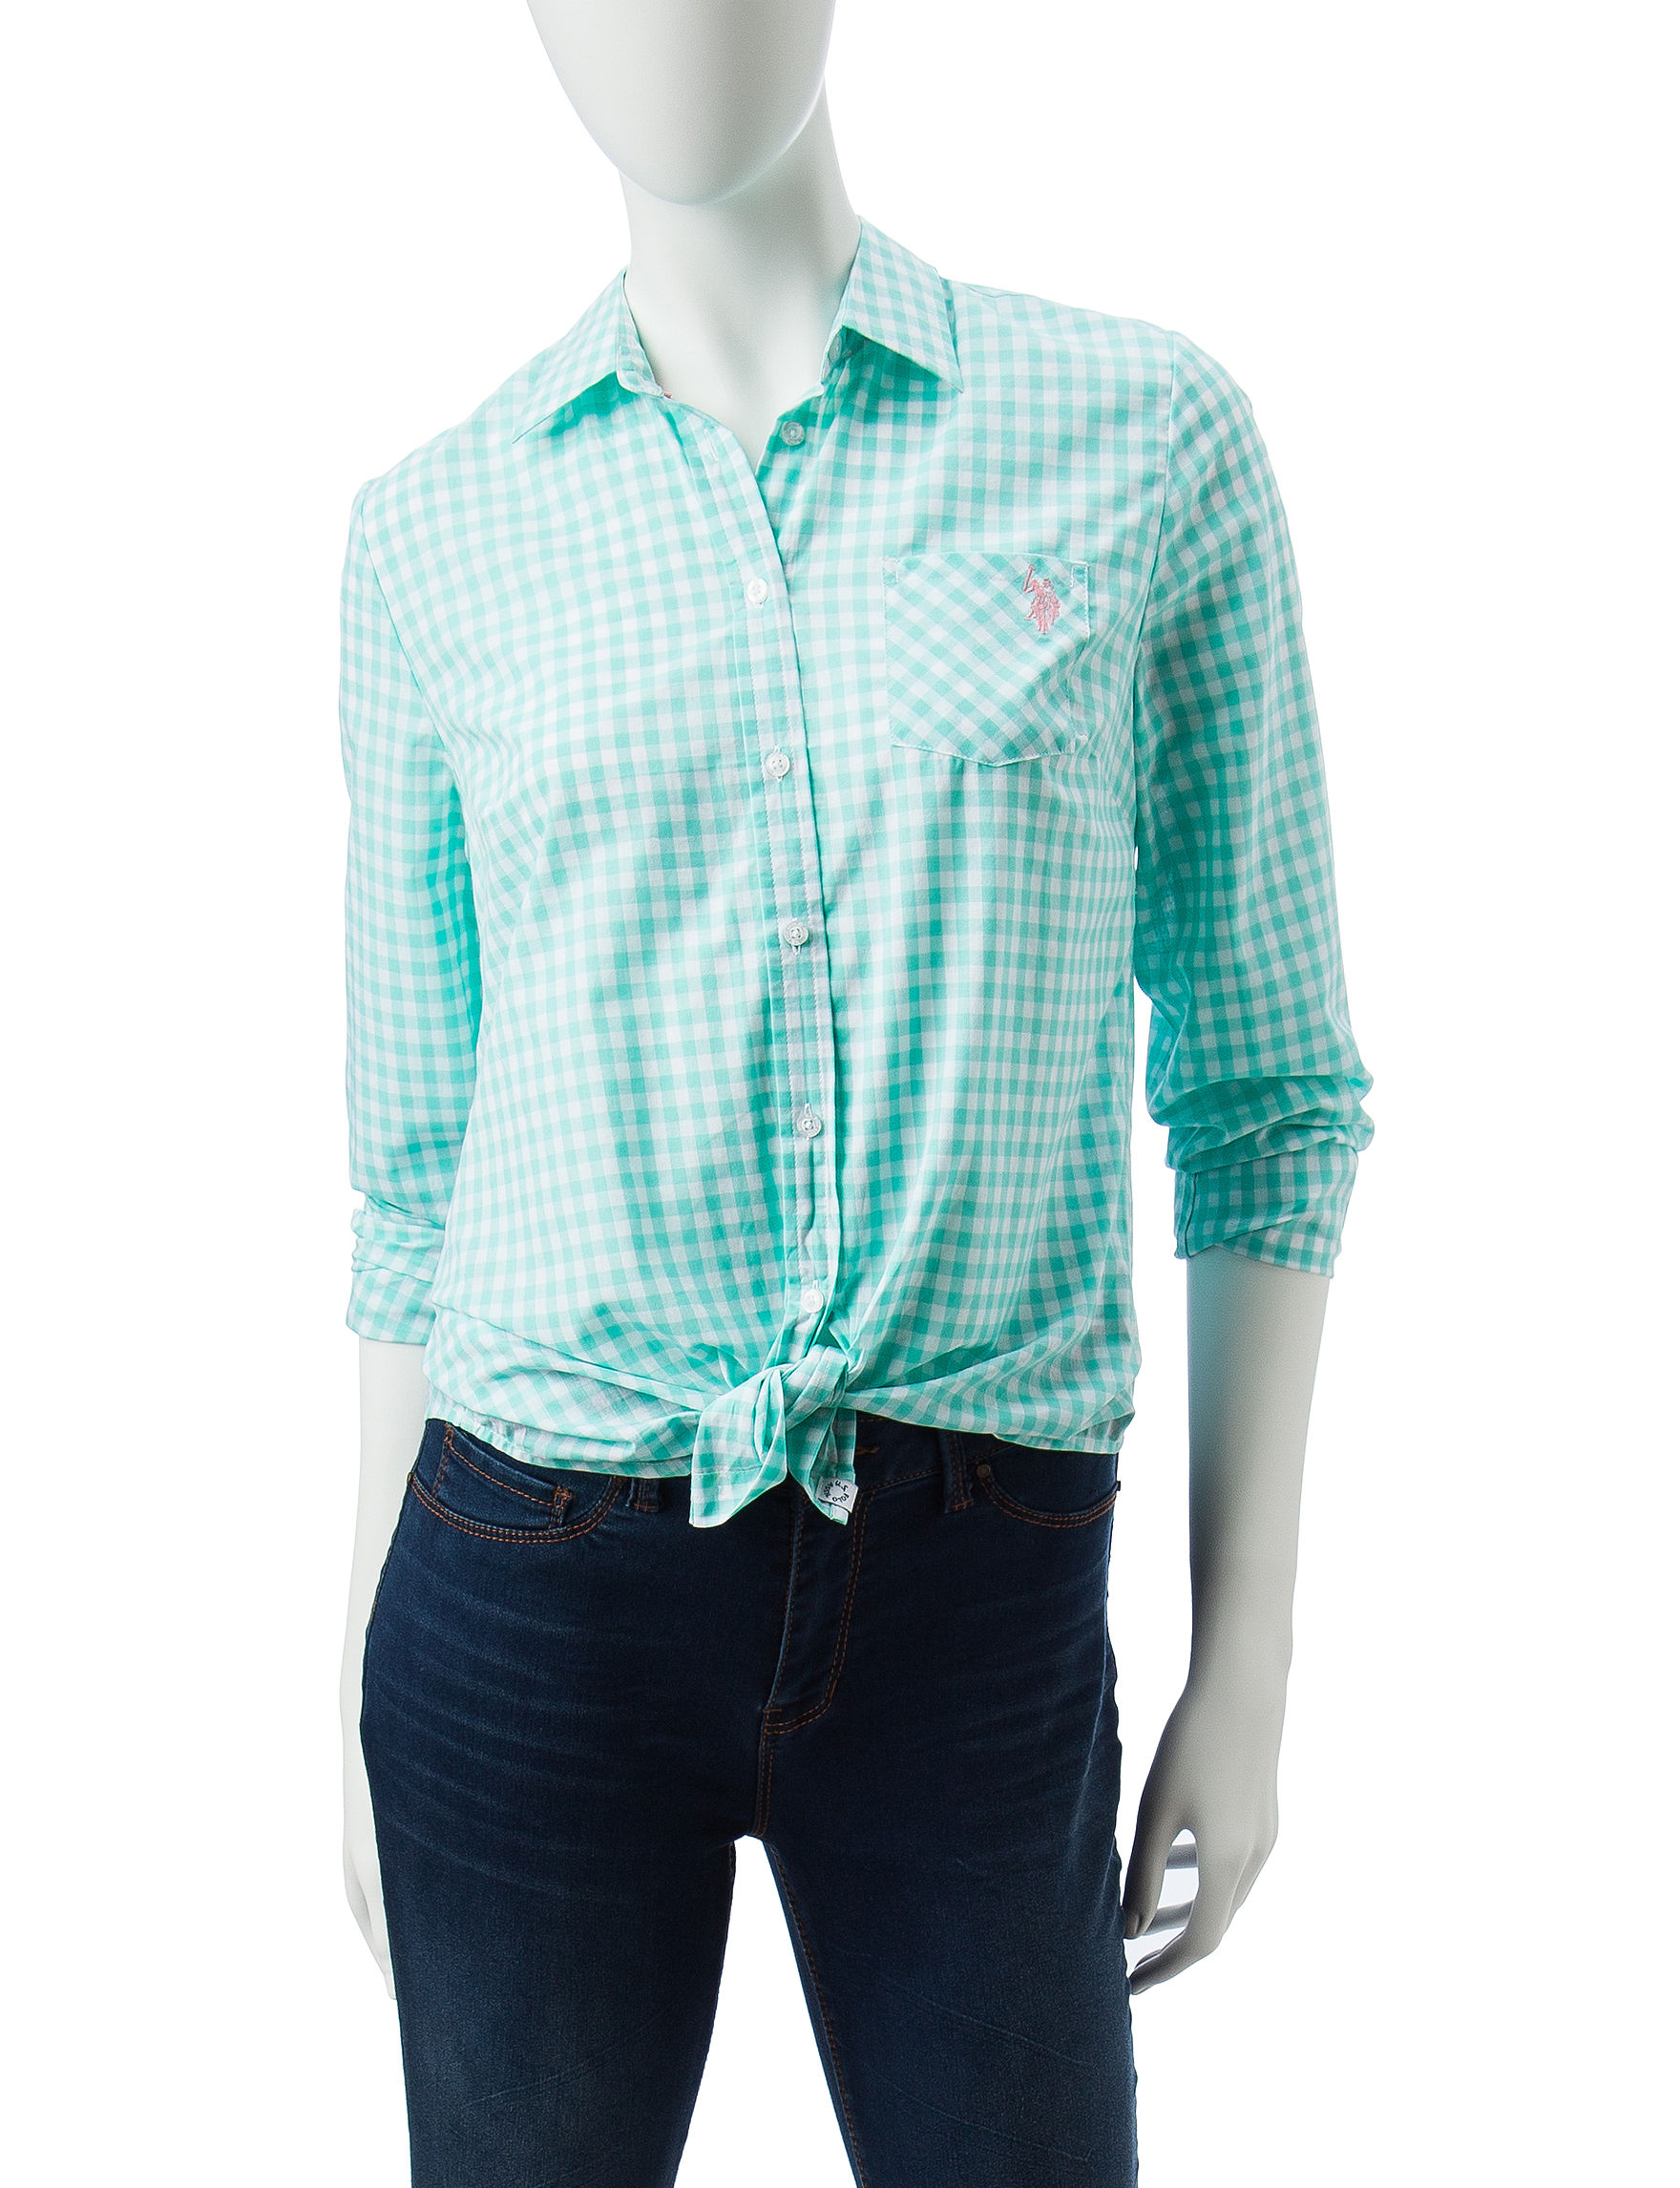 U.S. Polo Assn. Blue Shirts & Blouses